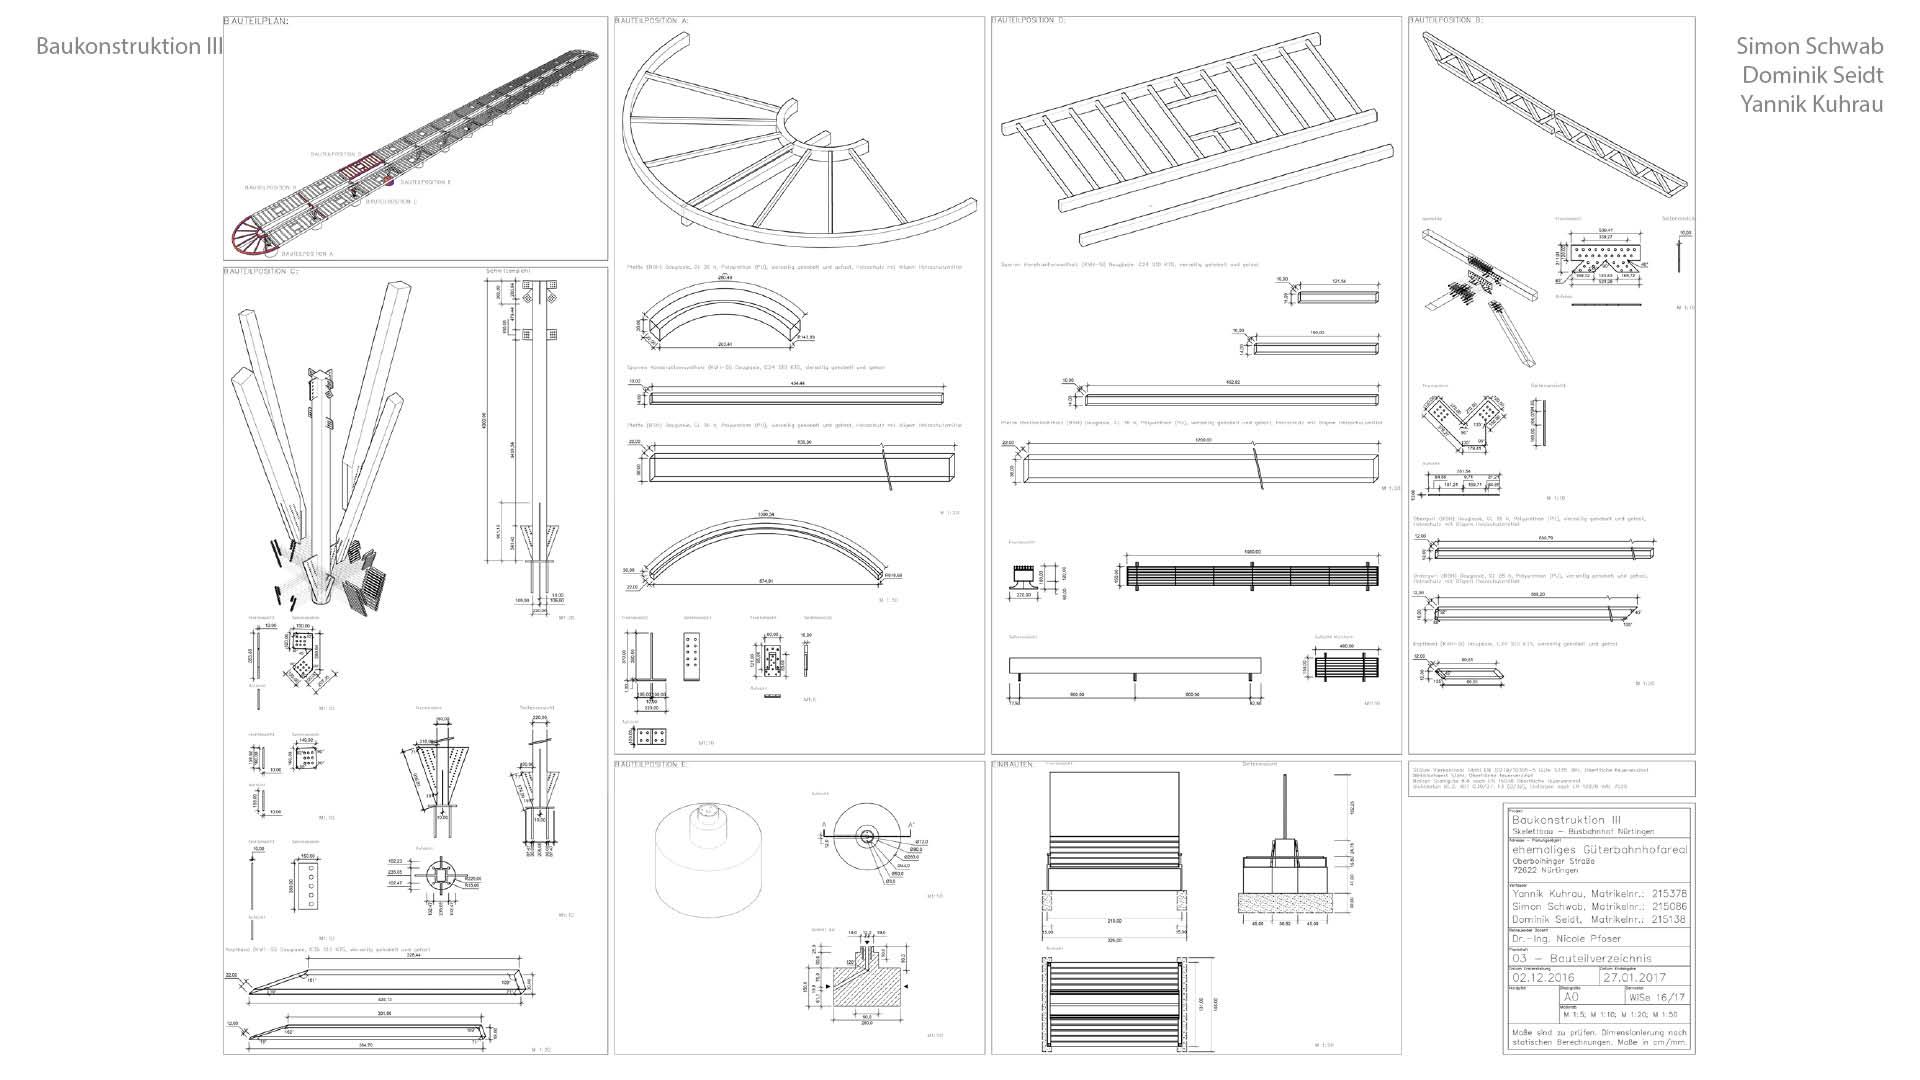 03 16 3 Baukonstruktion 3